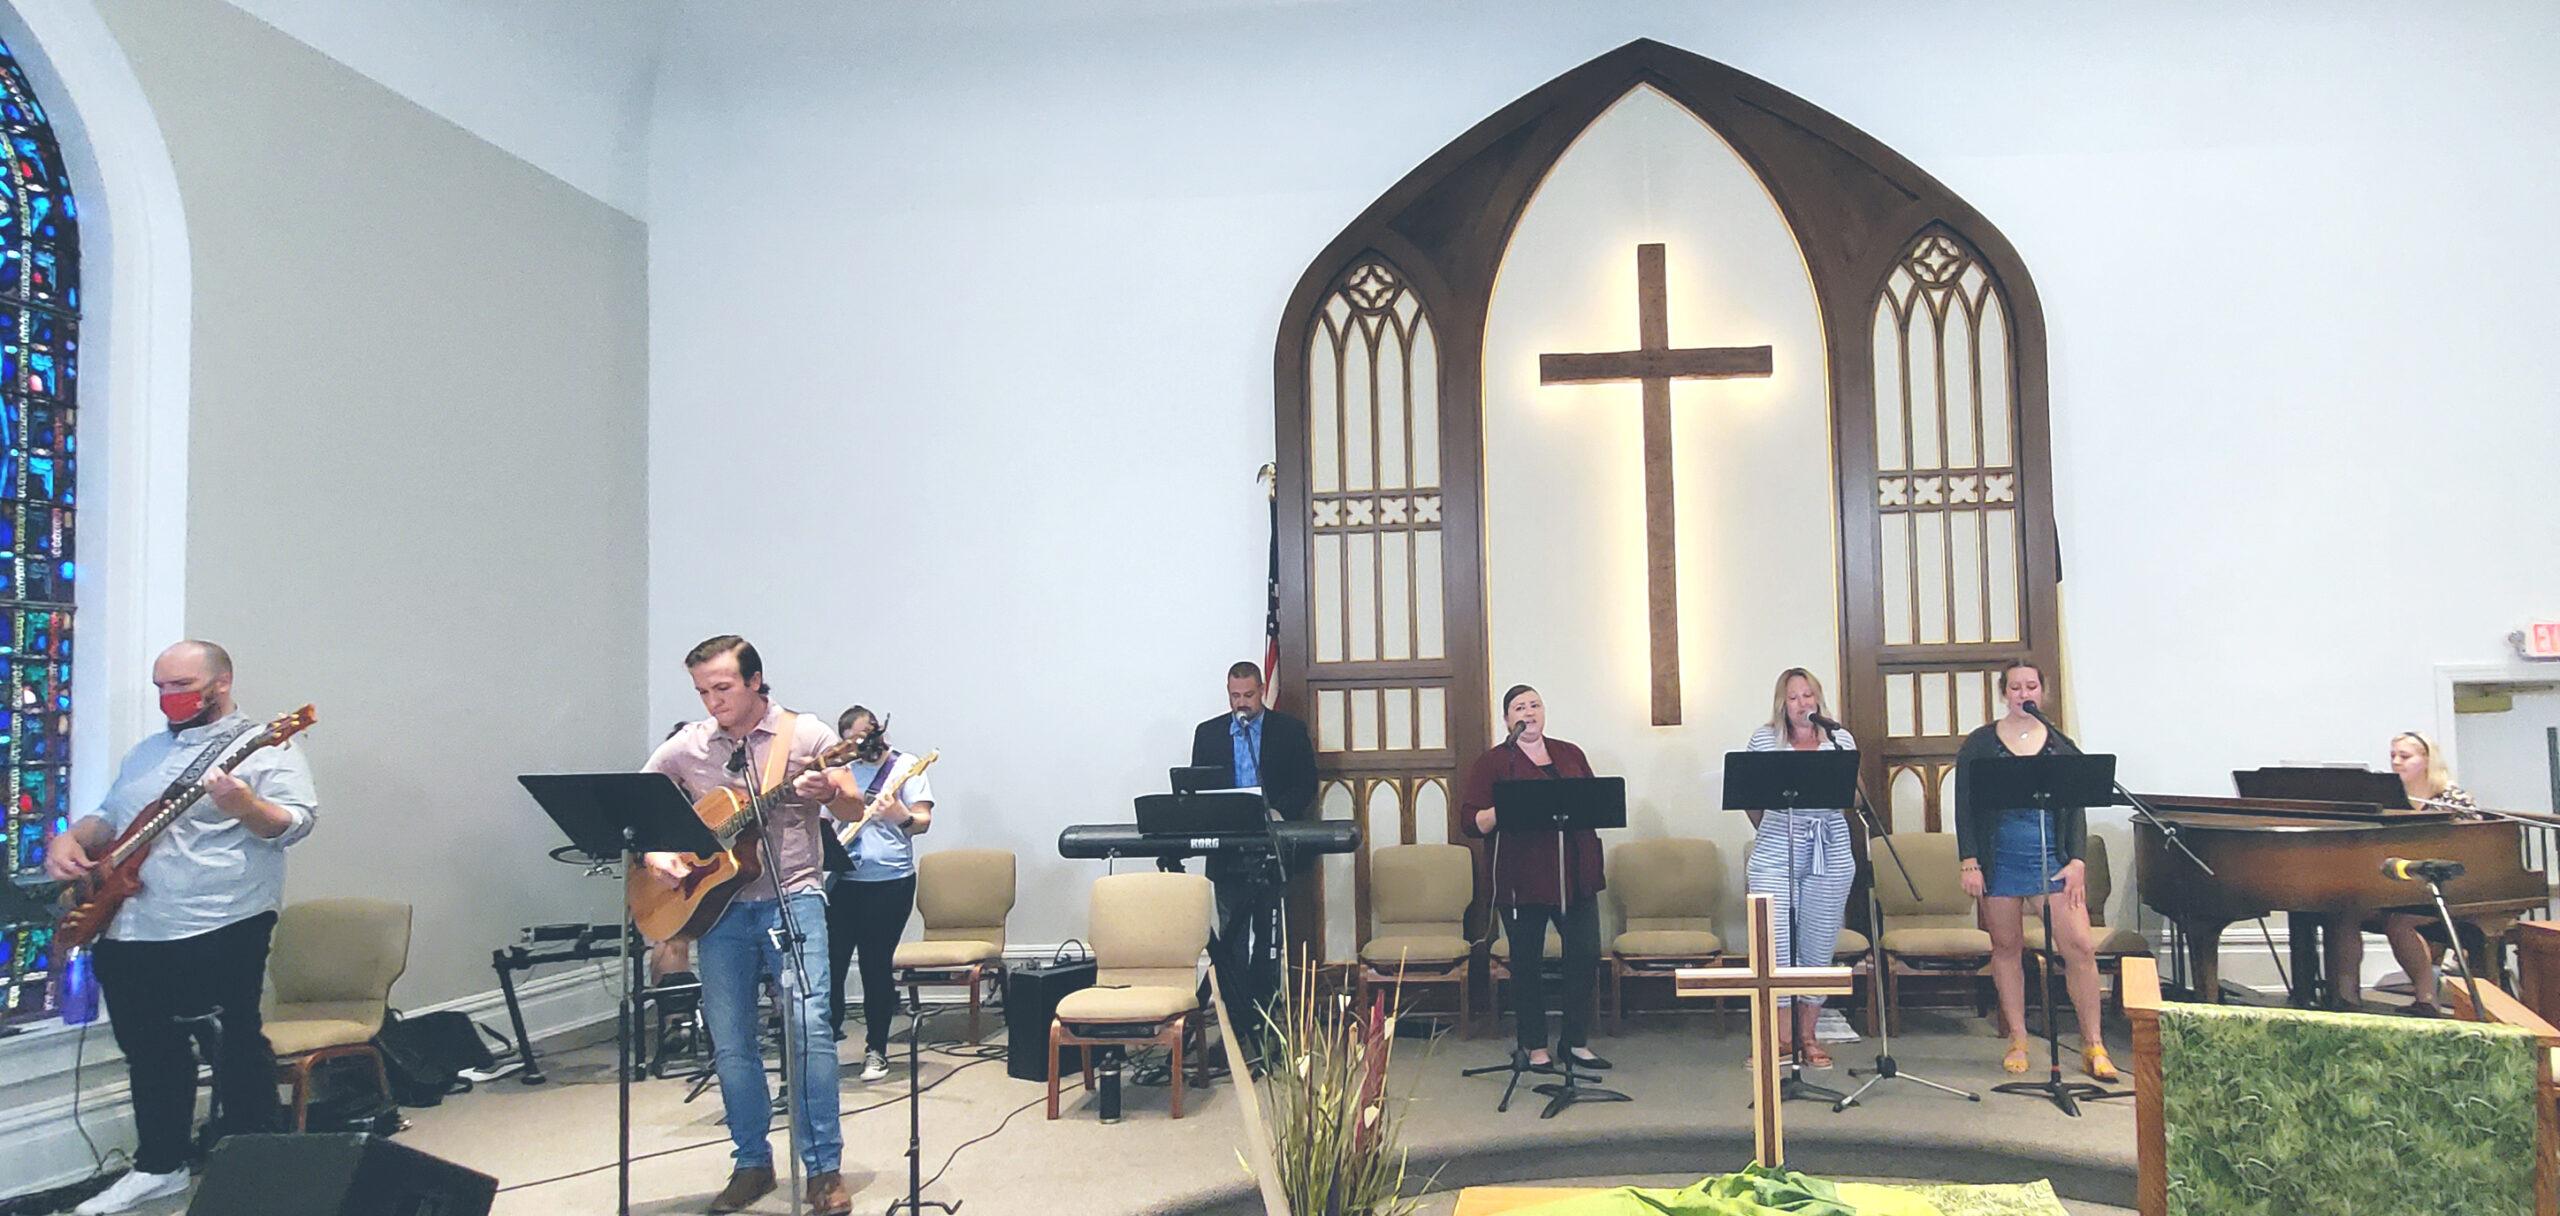 Come Beloved Band